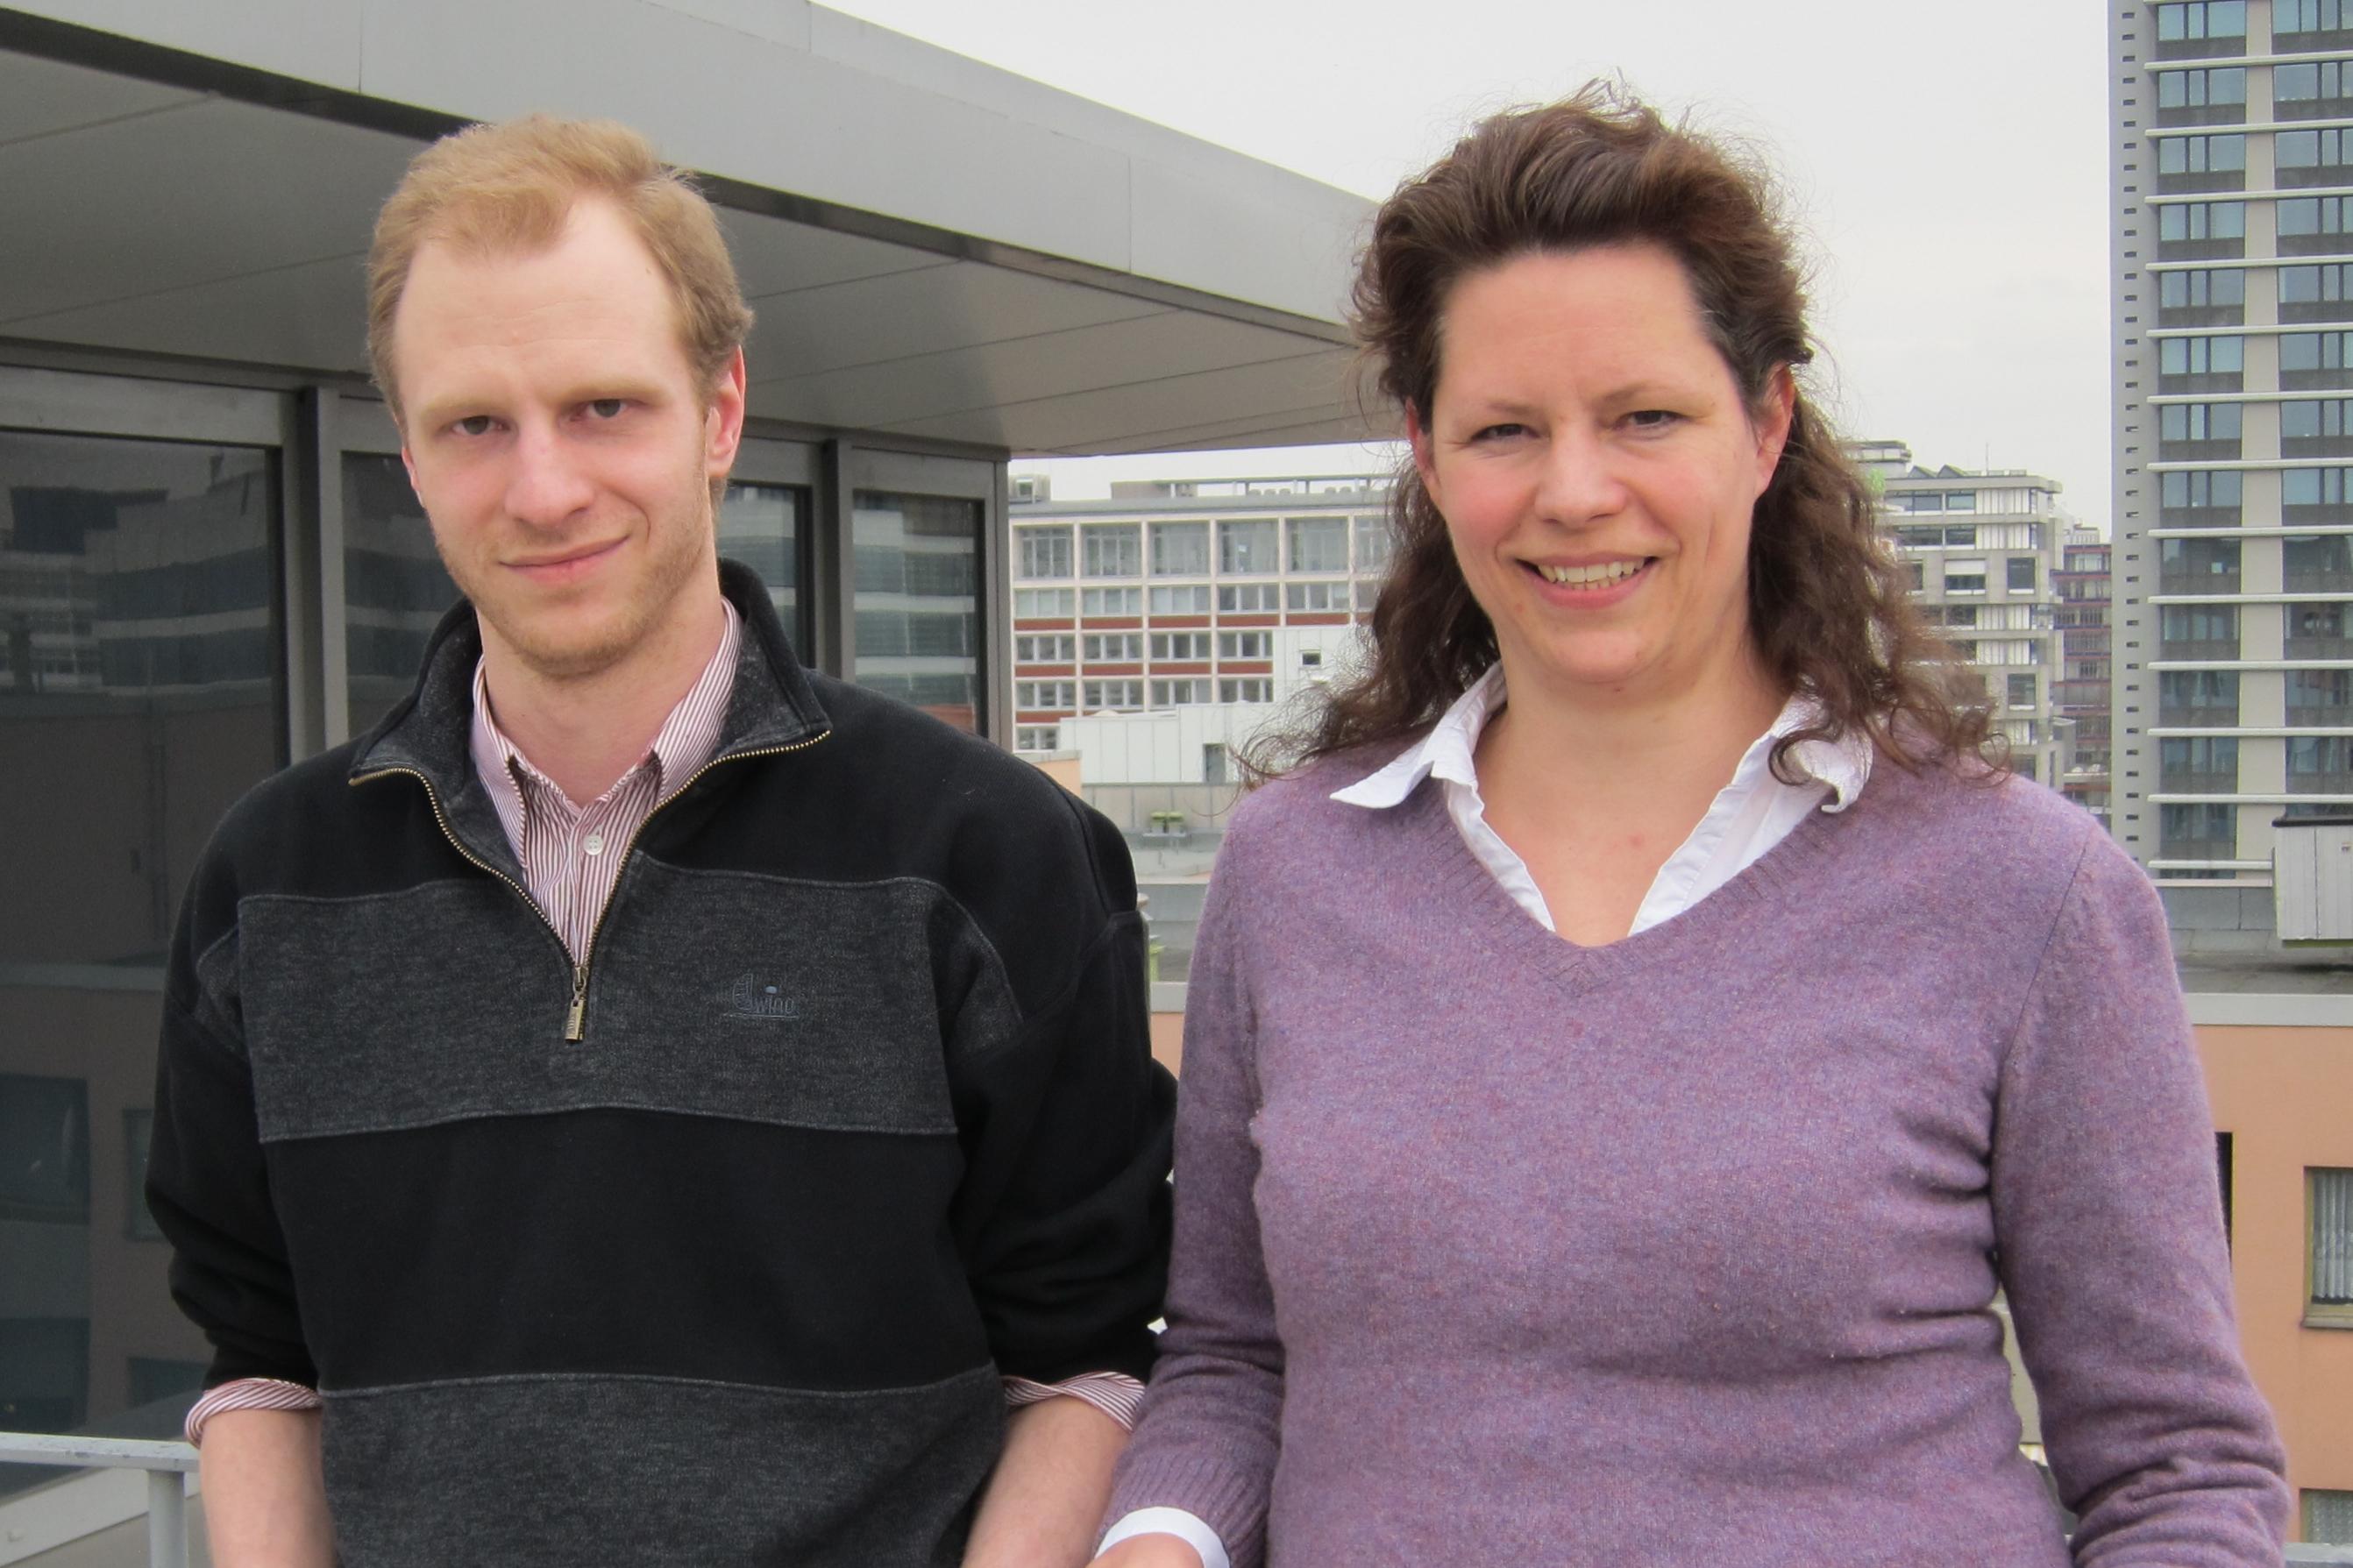 Jonathan and Susanna Gebauer